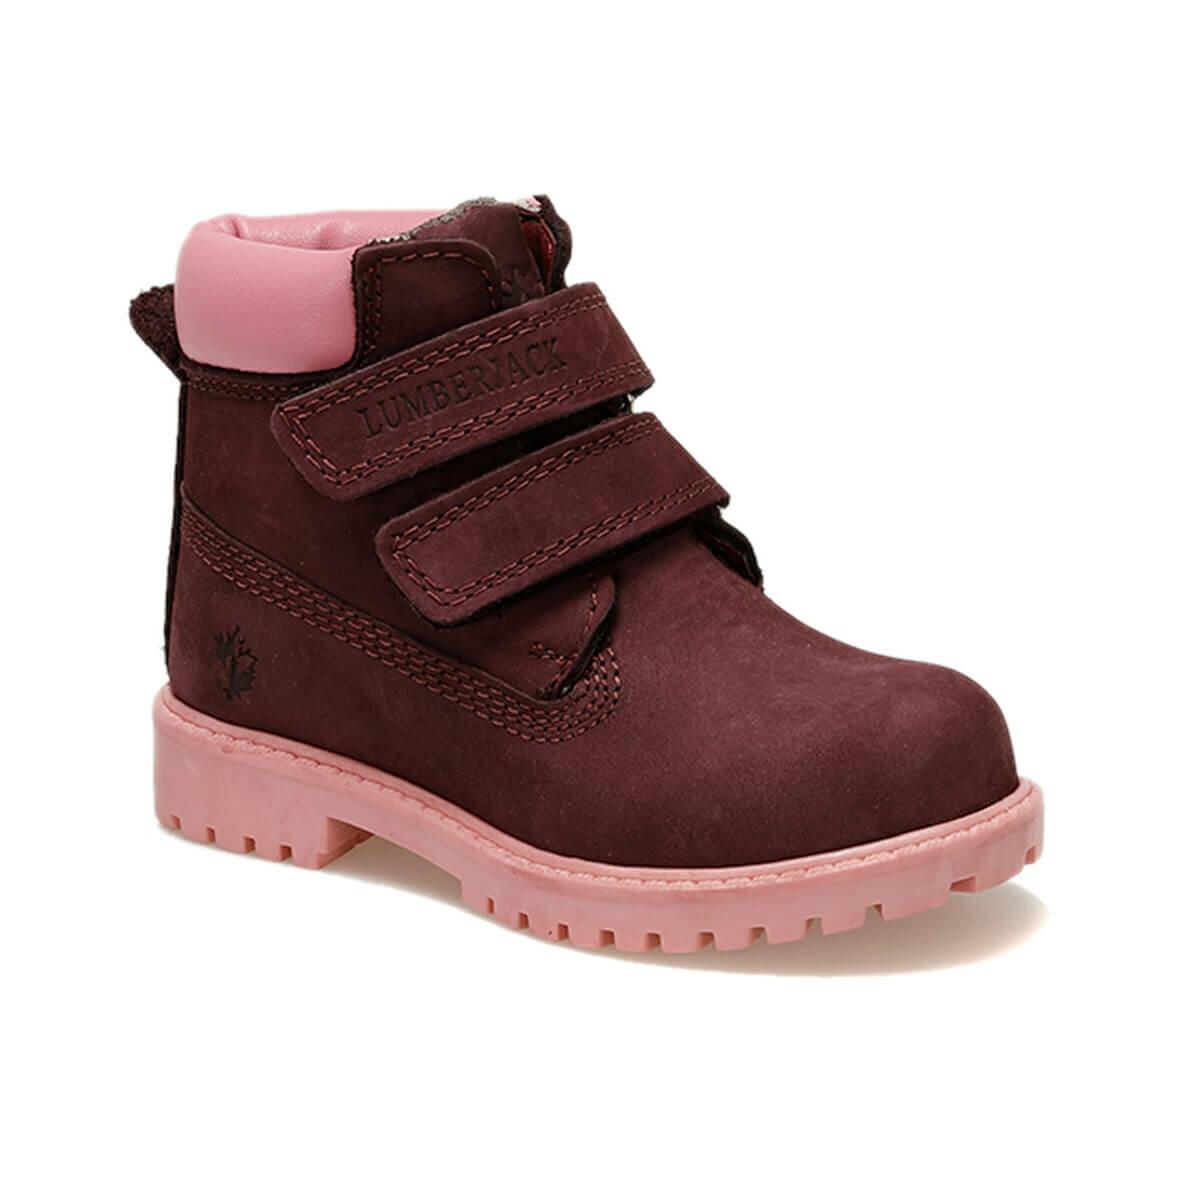 FLO RIVER 9PR Pink Female Child Boots LUMBERJACK